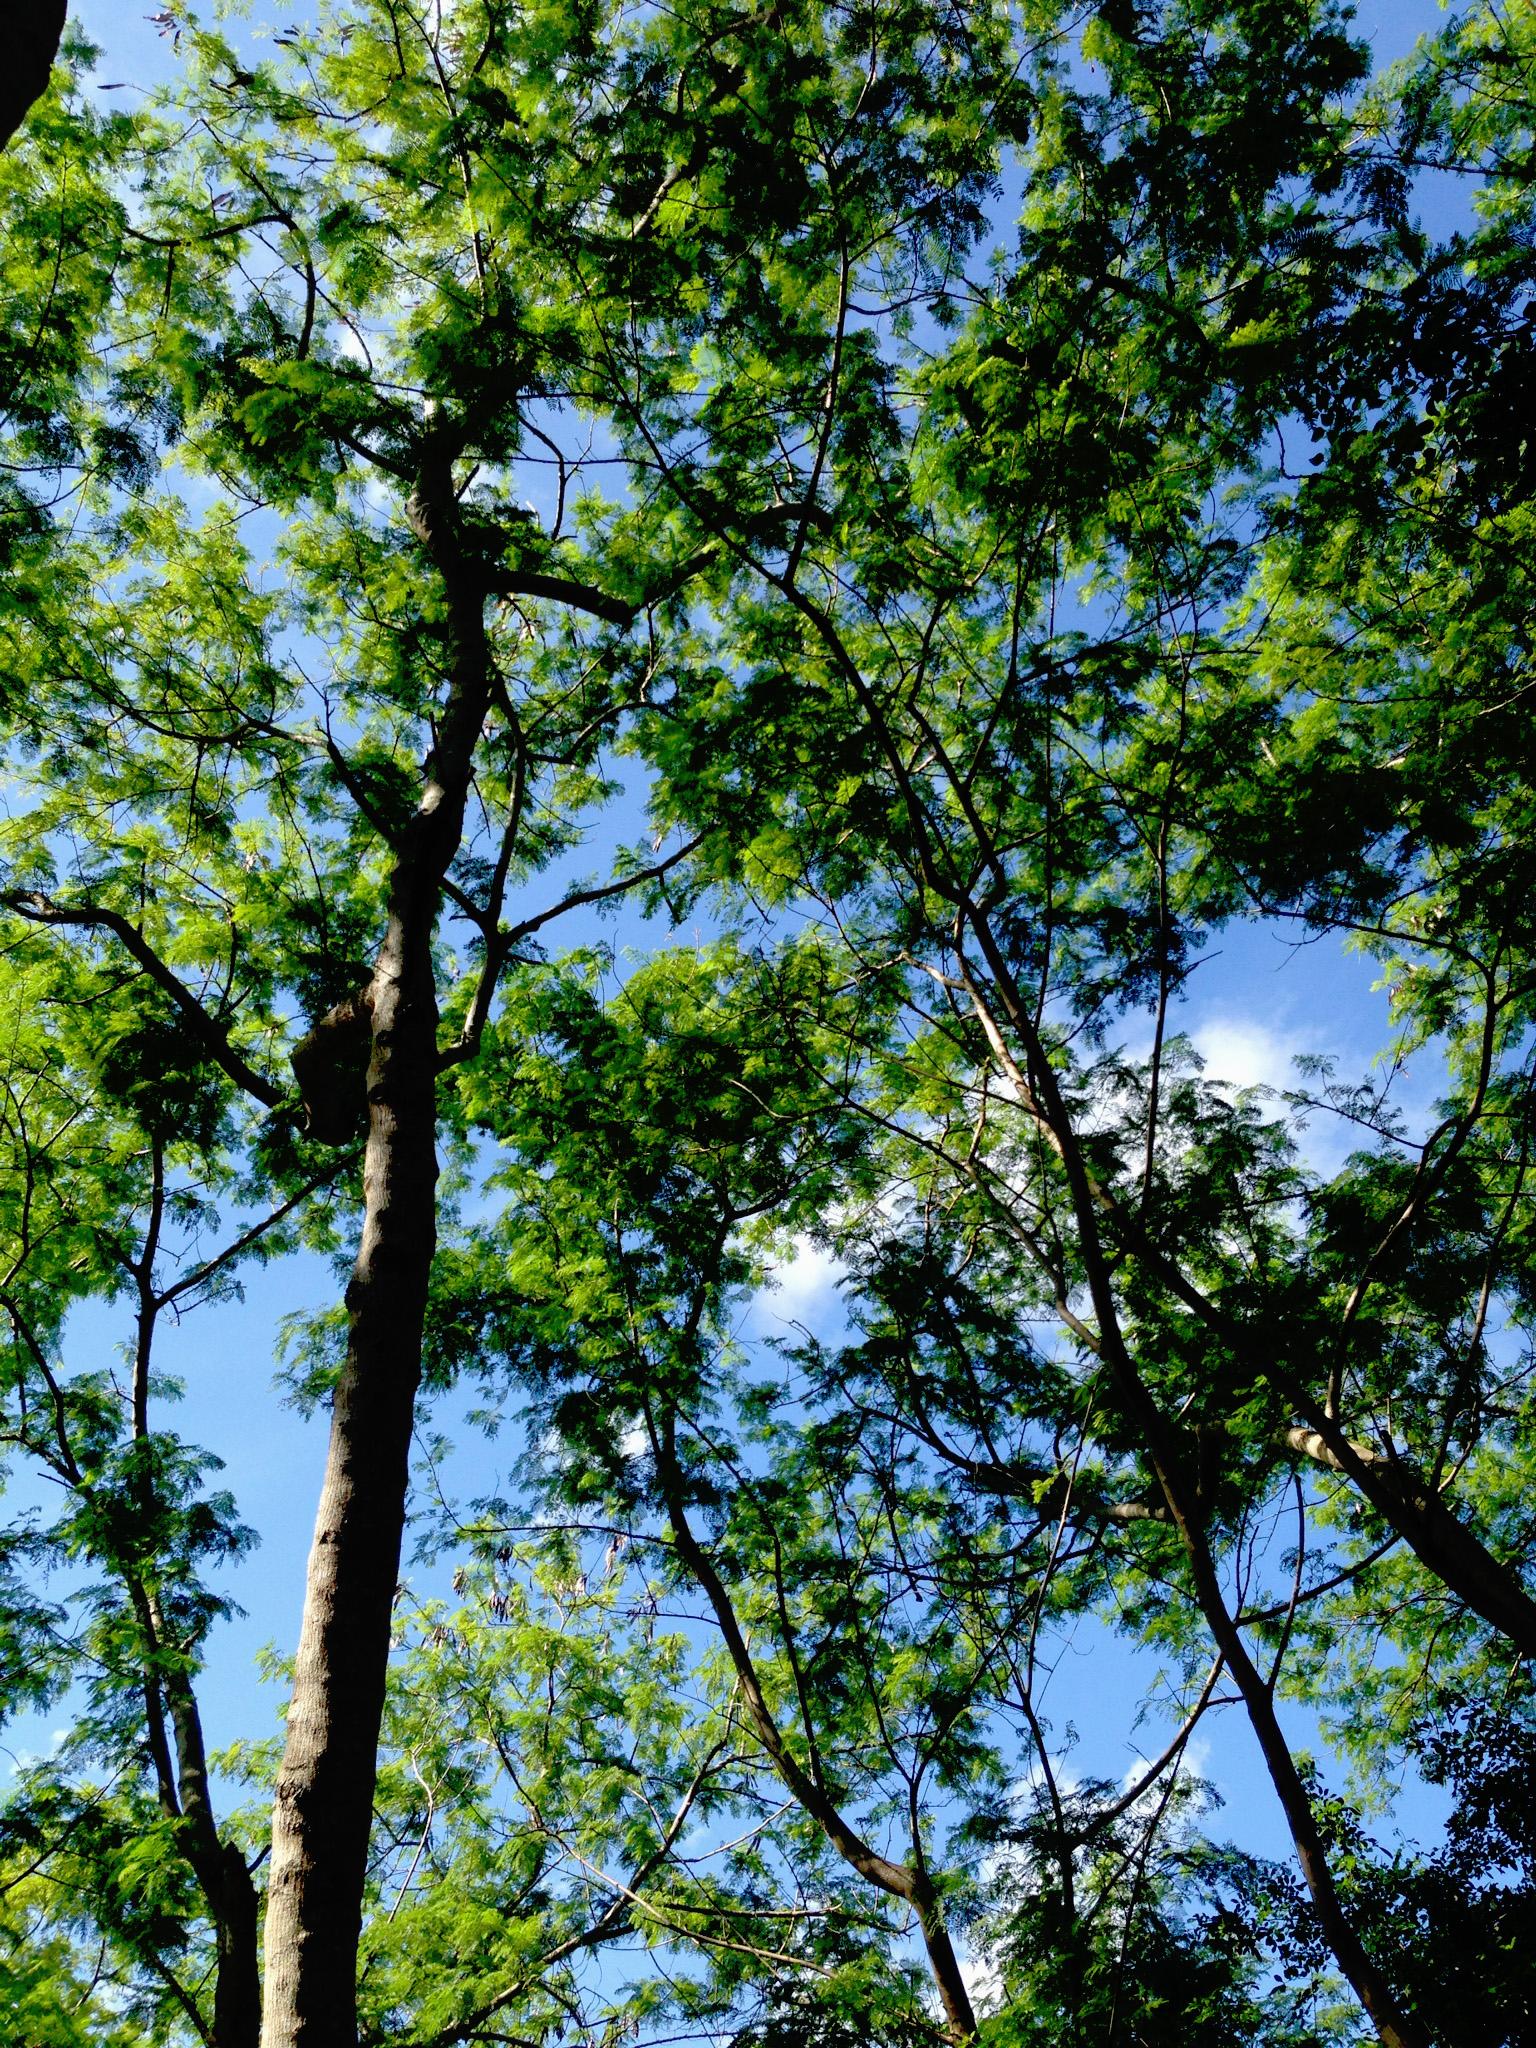 Trees in Miami, Florida / Darker than Green